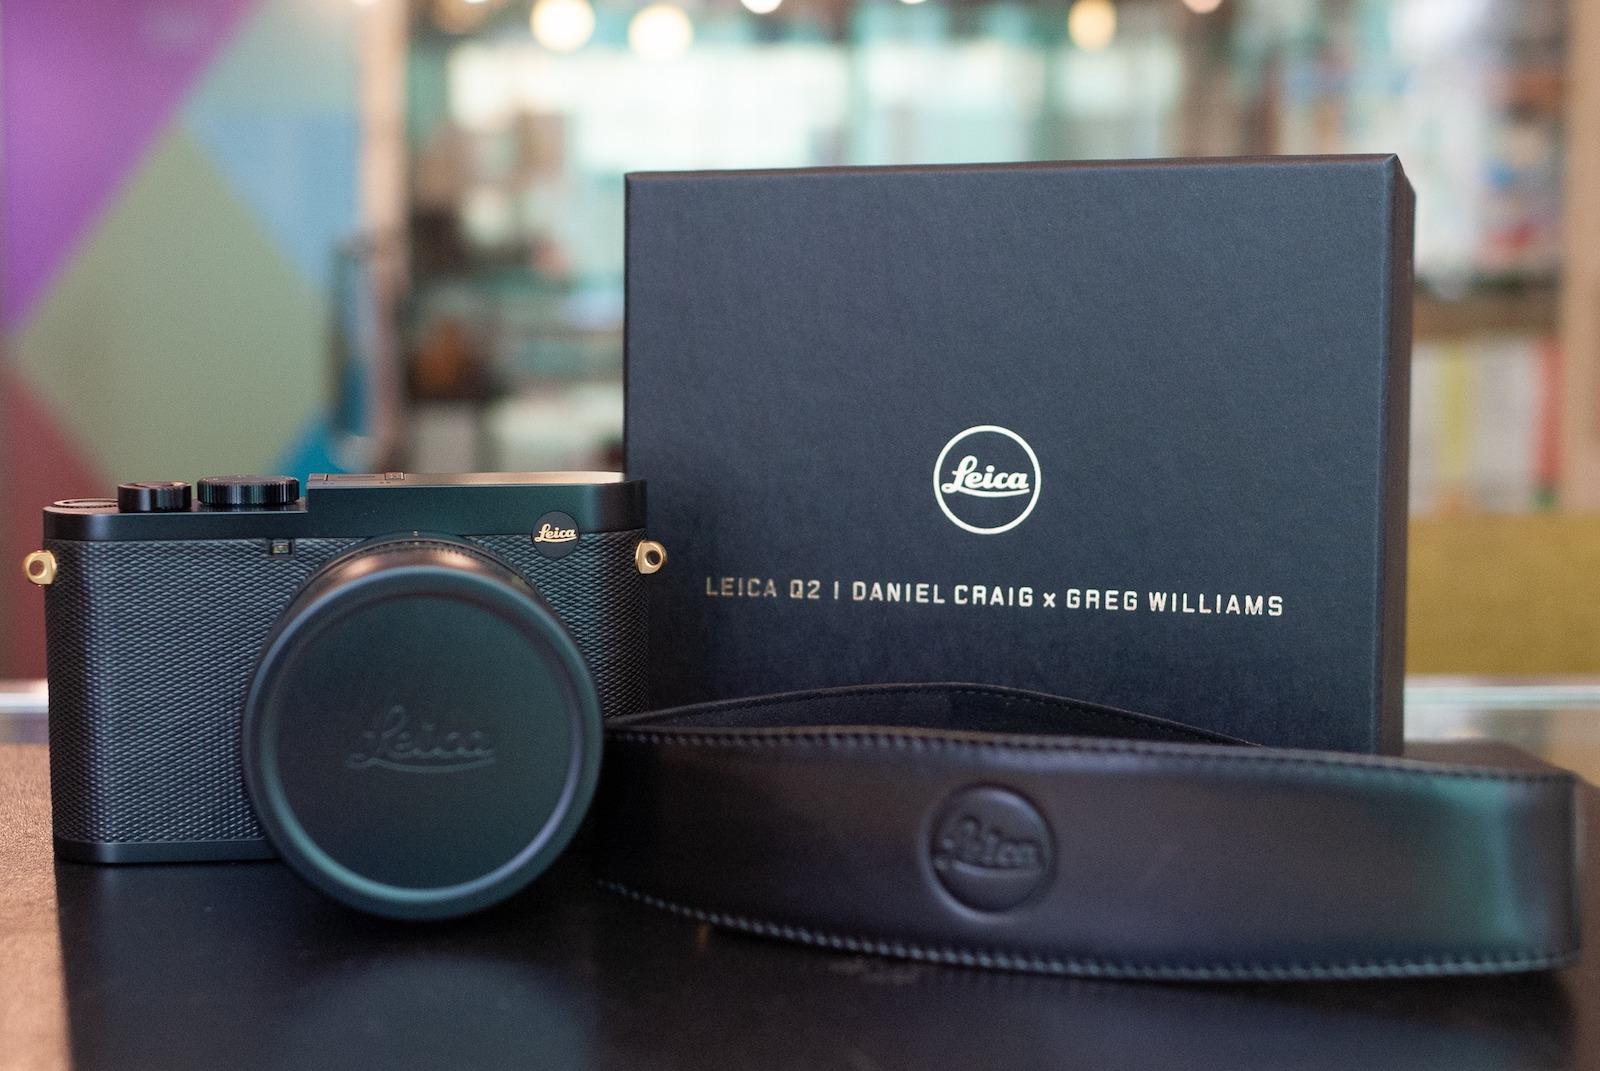 The Leica Q2 Daniel Craig x Greg Williams limited edition camera is already sold out - Leica Rumors